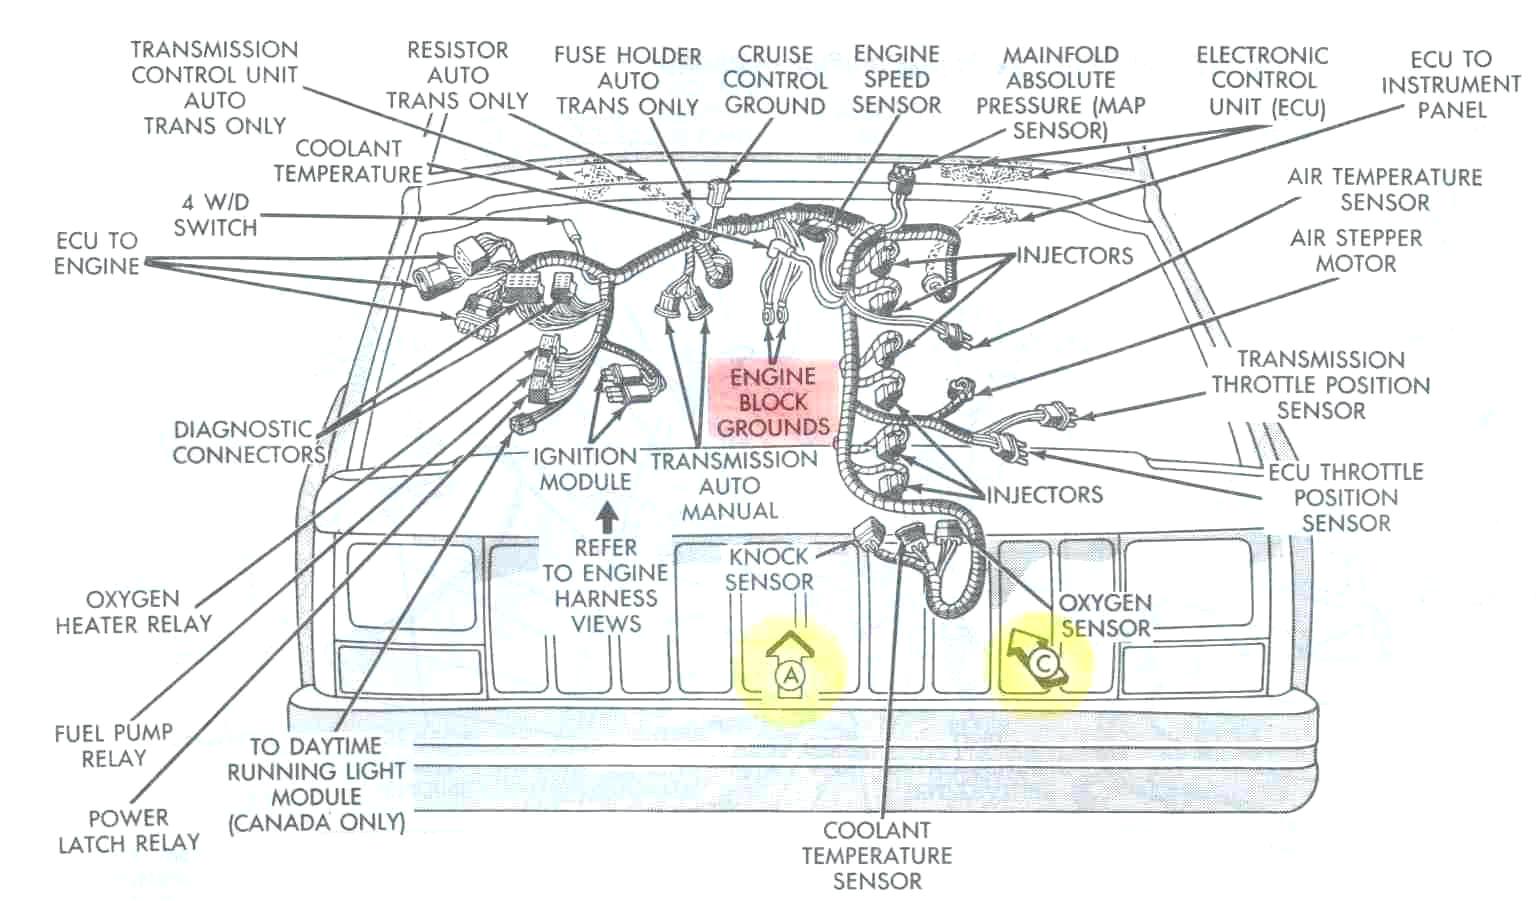 2001 jeep cherokee wiring harness wiring diagram post jeep cherokee trailer wiring harness 2001 jeep wiring